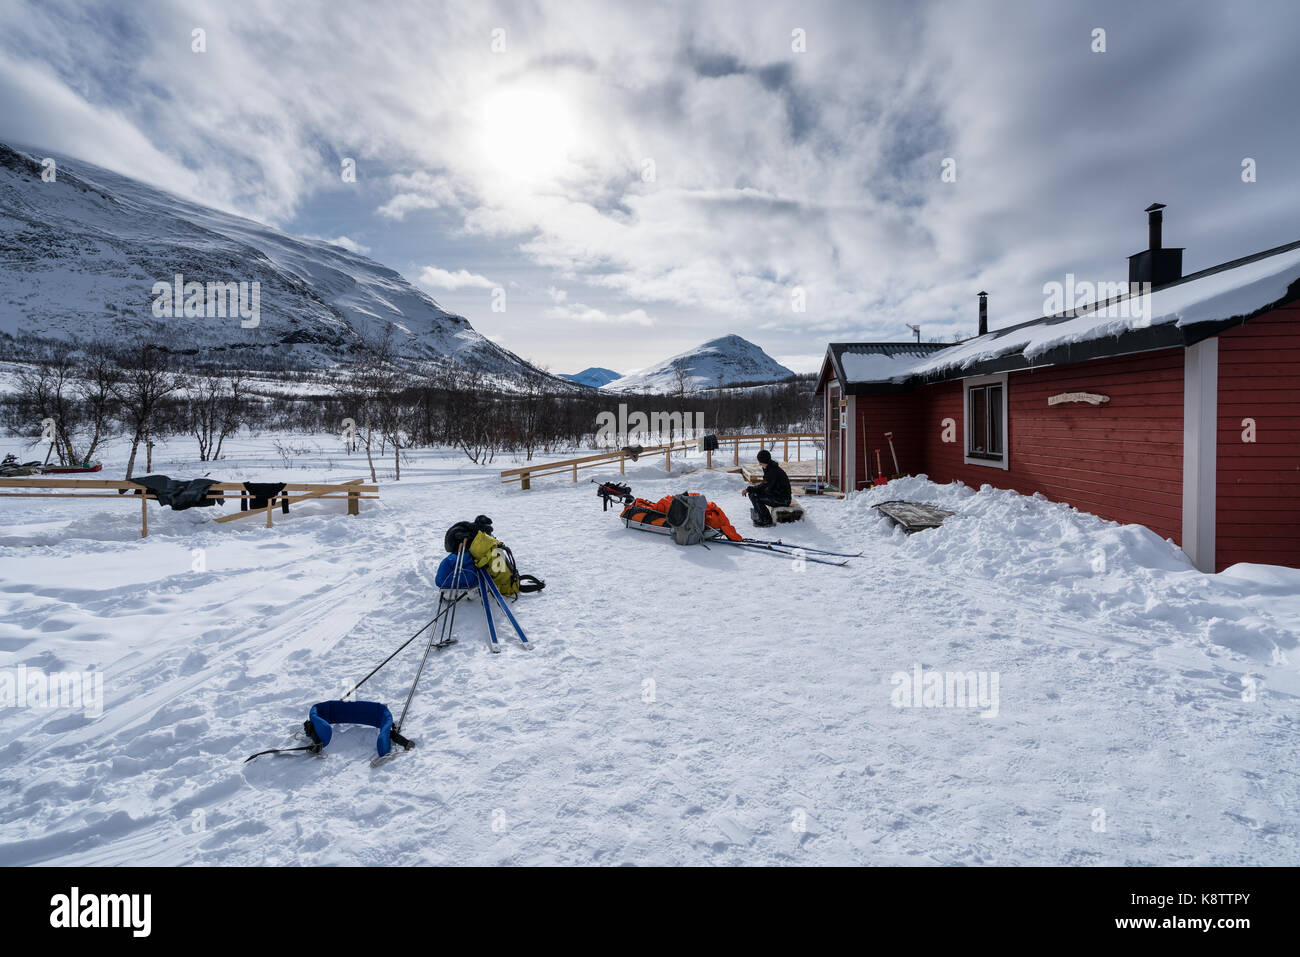 Sci alpinismo in abisko national park, Svezia, Europa Immagini Stock